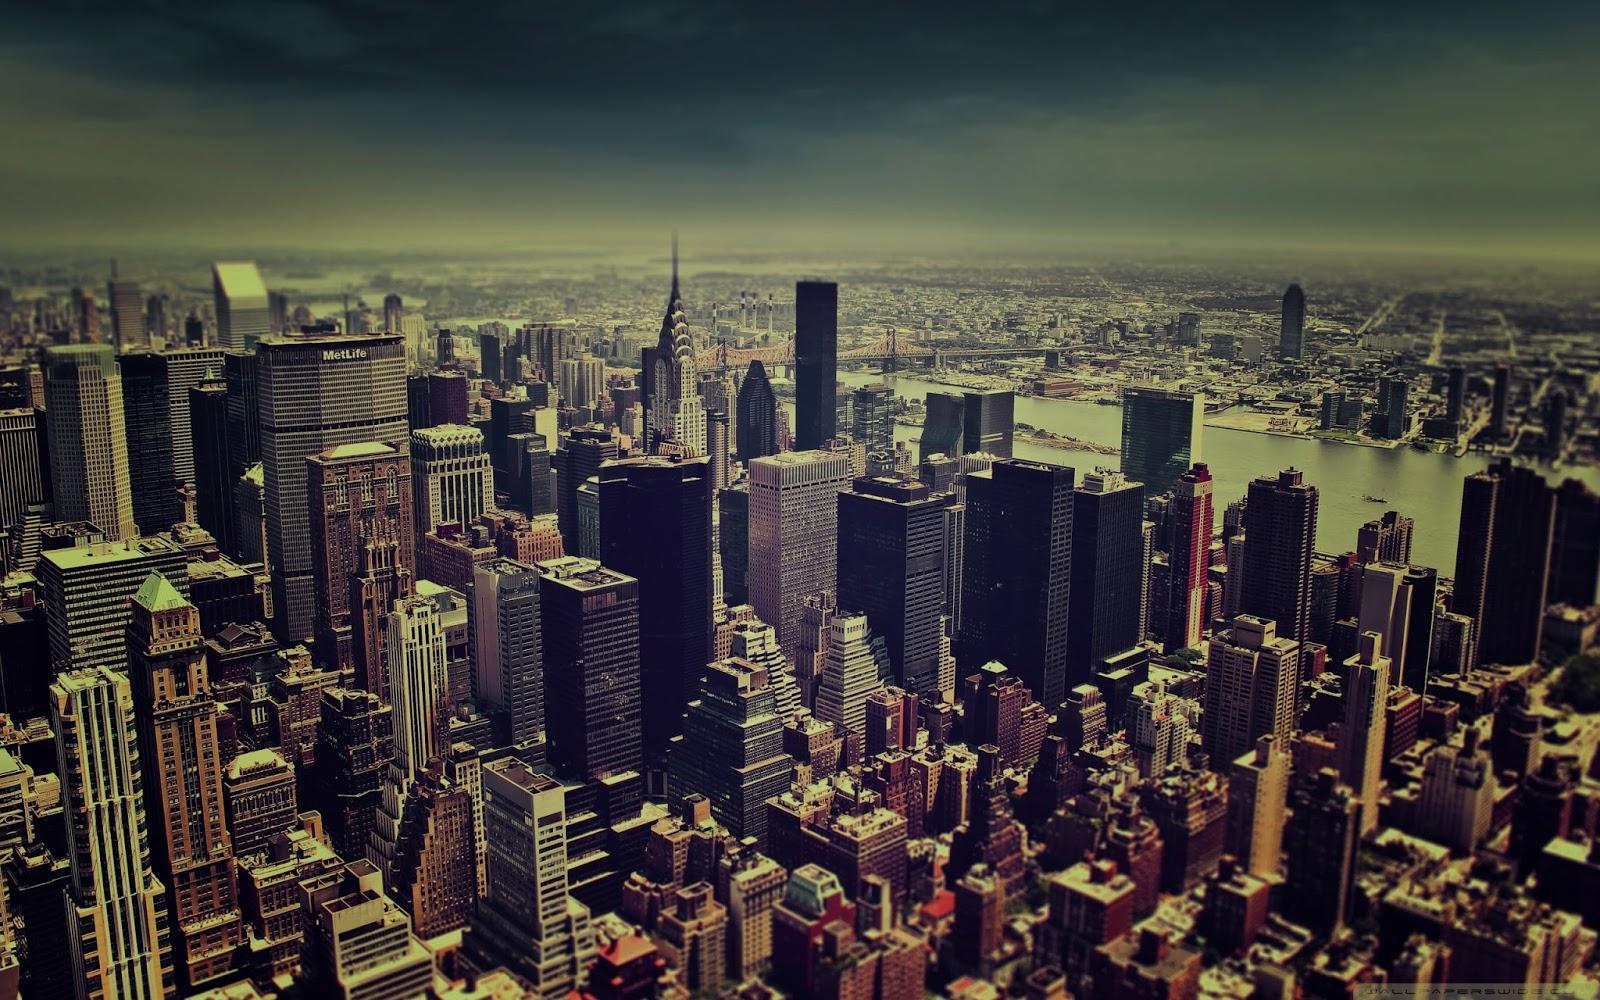 hdwallpaperspackin New York City HD Wallpapers Download 1080p 1600x1000